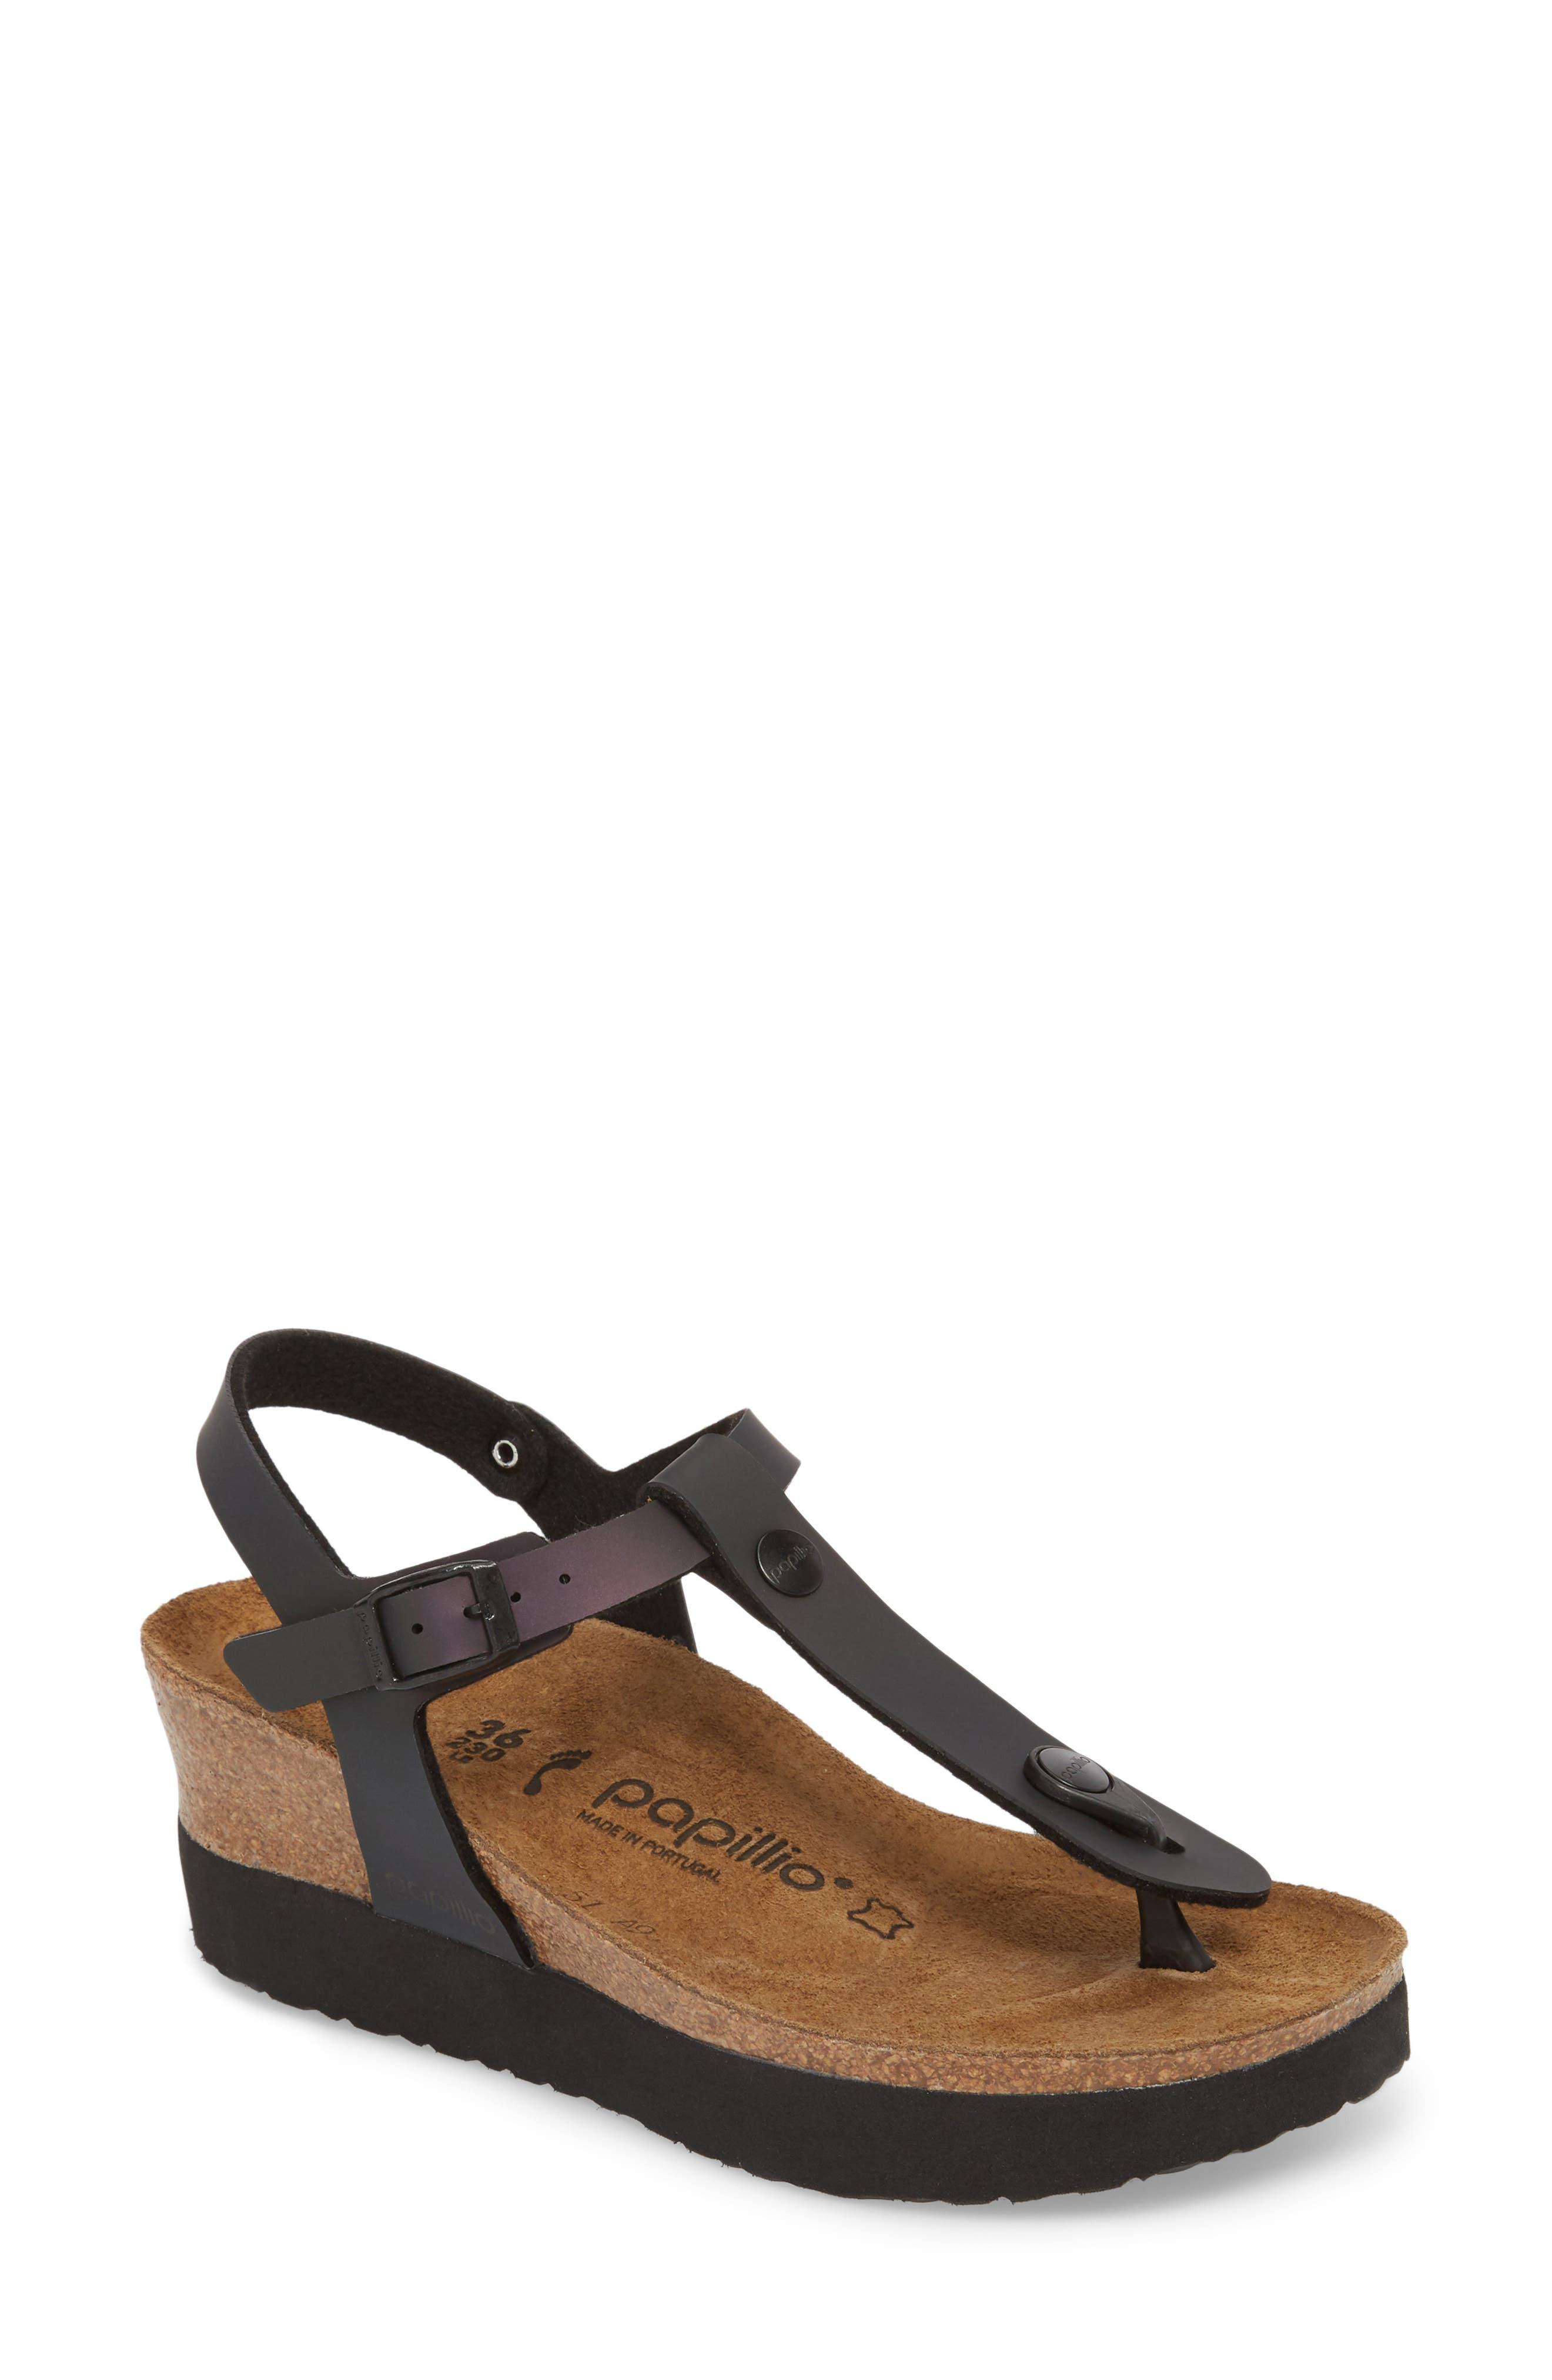 Ashley Sandal,                         Main,                         color, Iridescent Black Leather